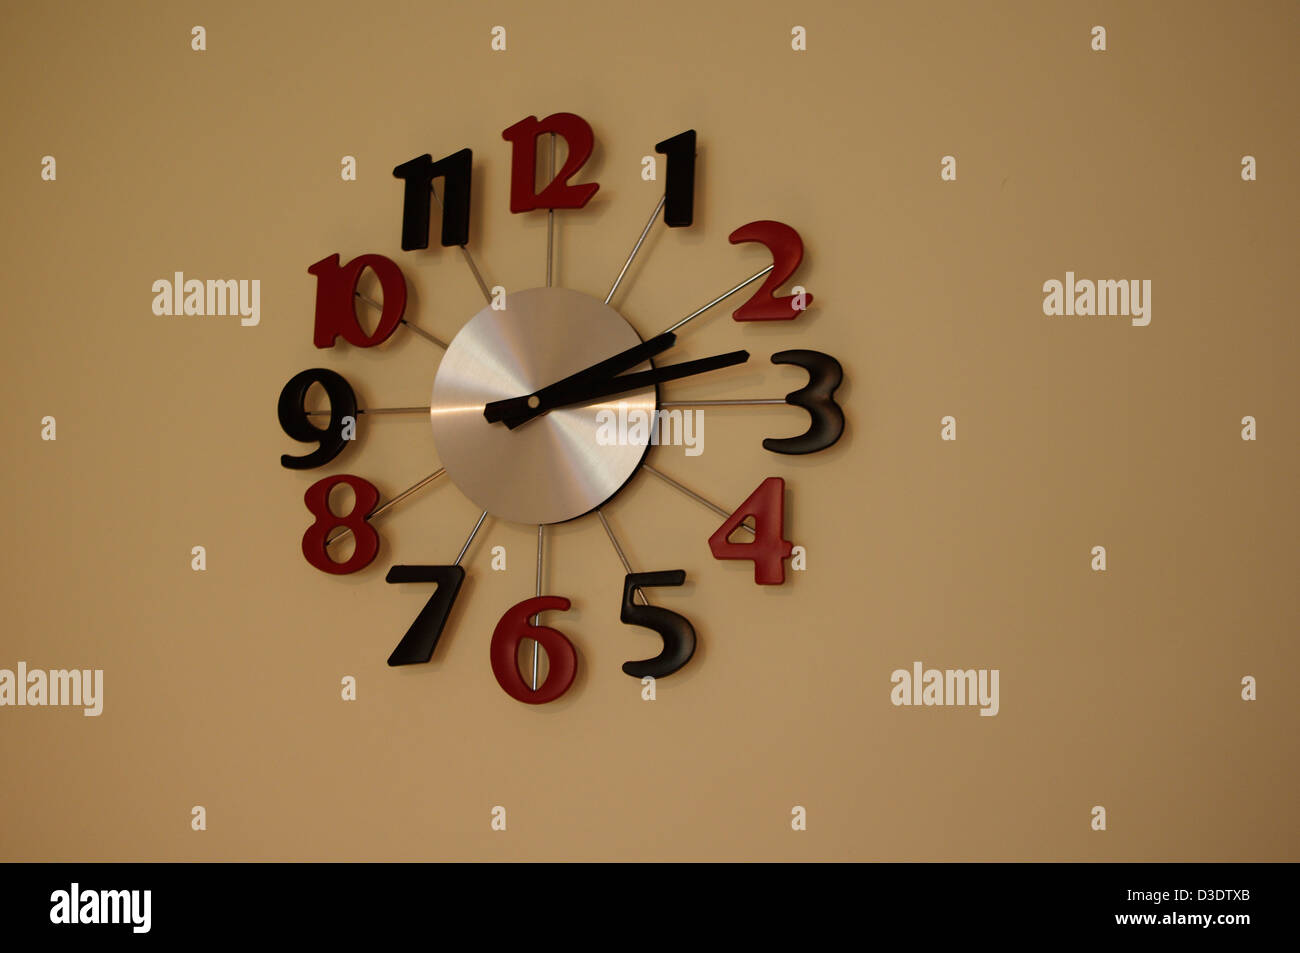 kitchen wall clock - Stock Image